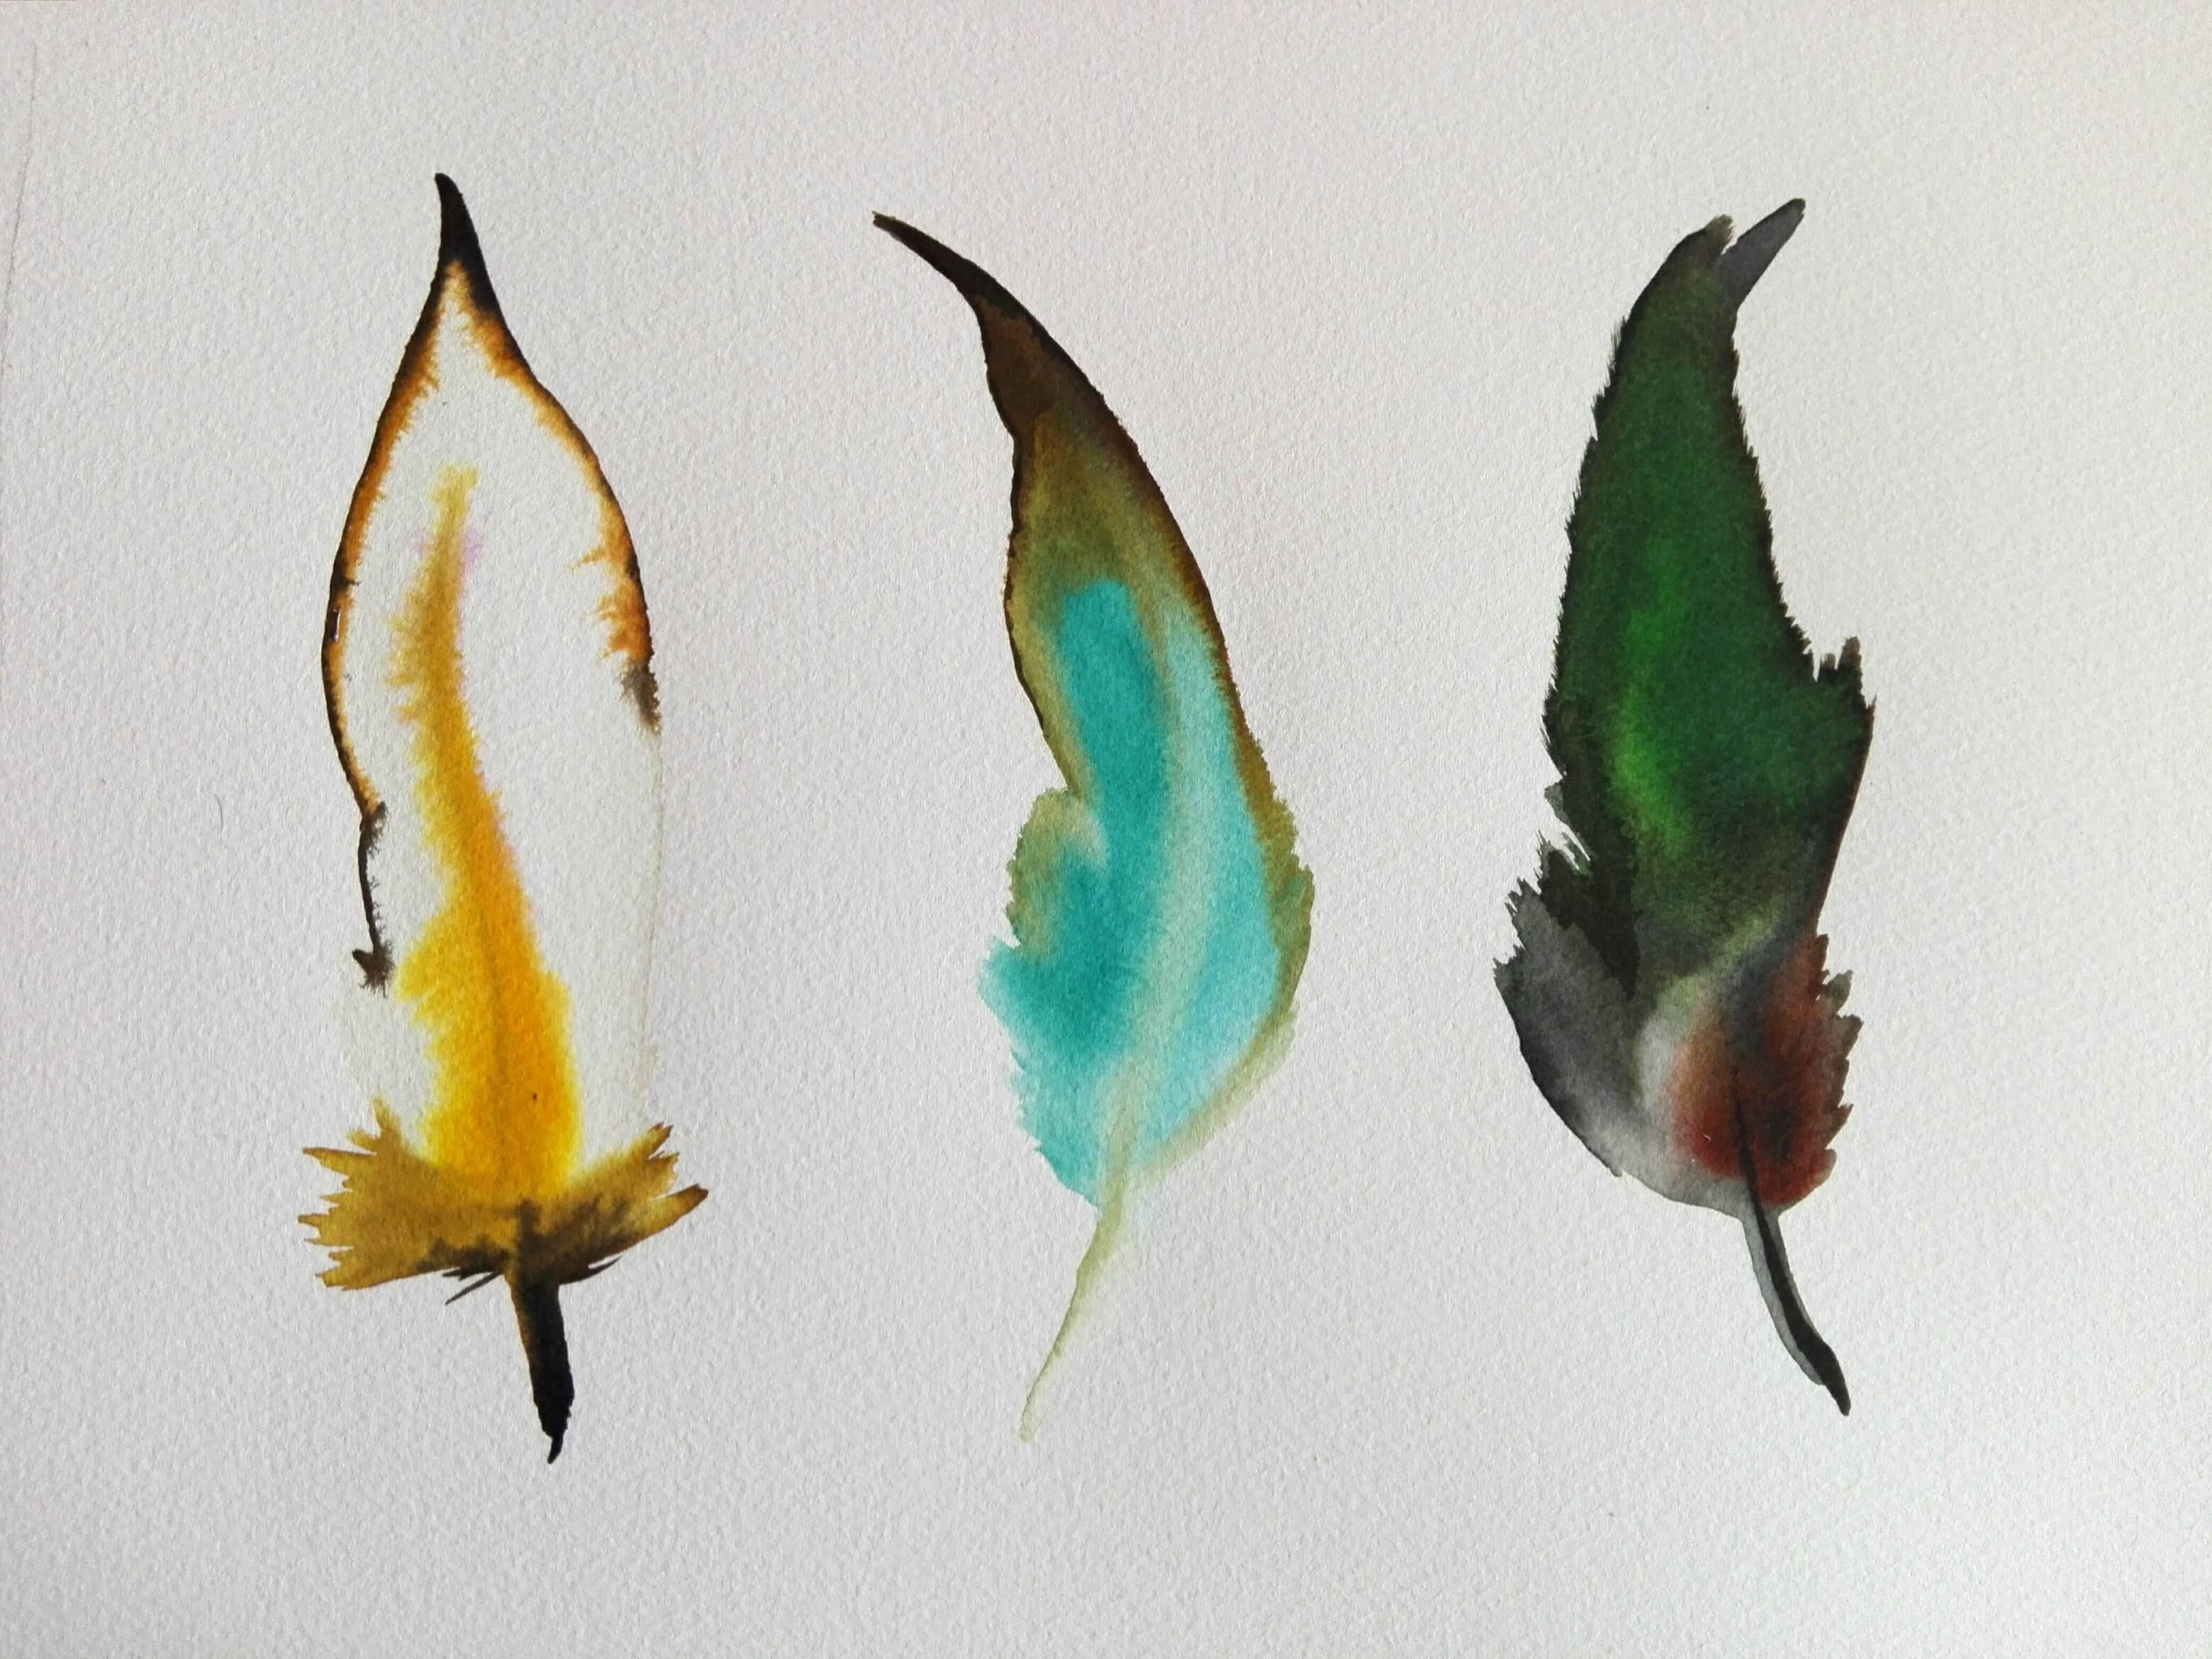 Federn gemalt